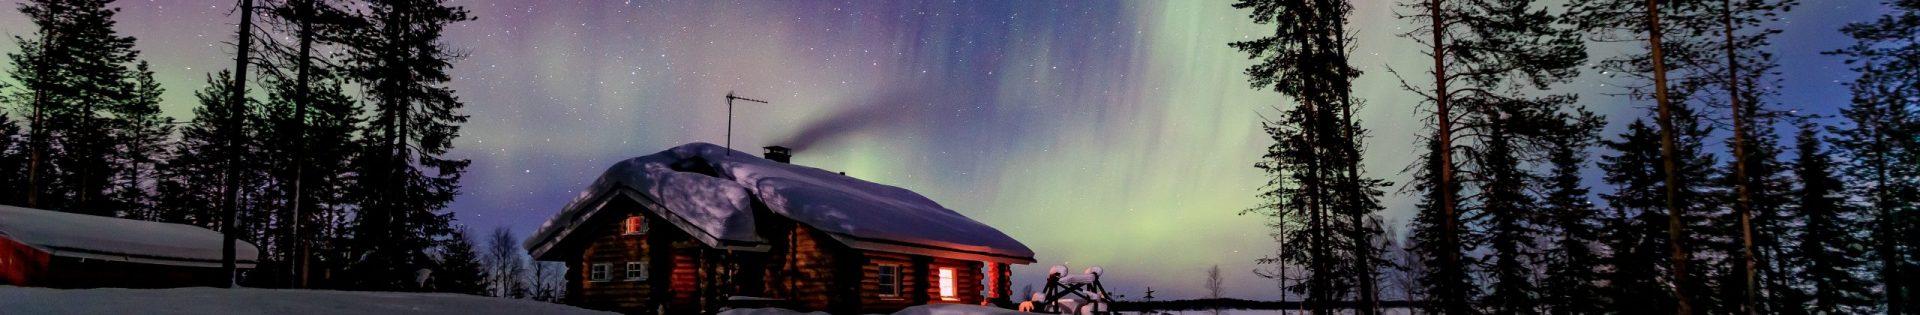 Schneemobil Adventure - Perfect Tours - Schneemobil Adventure Reisen - Finnland - Safari - Tour - Lappland